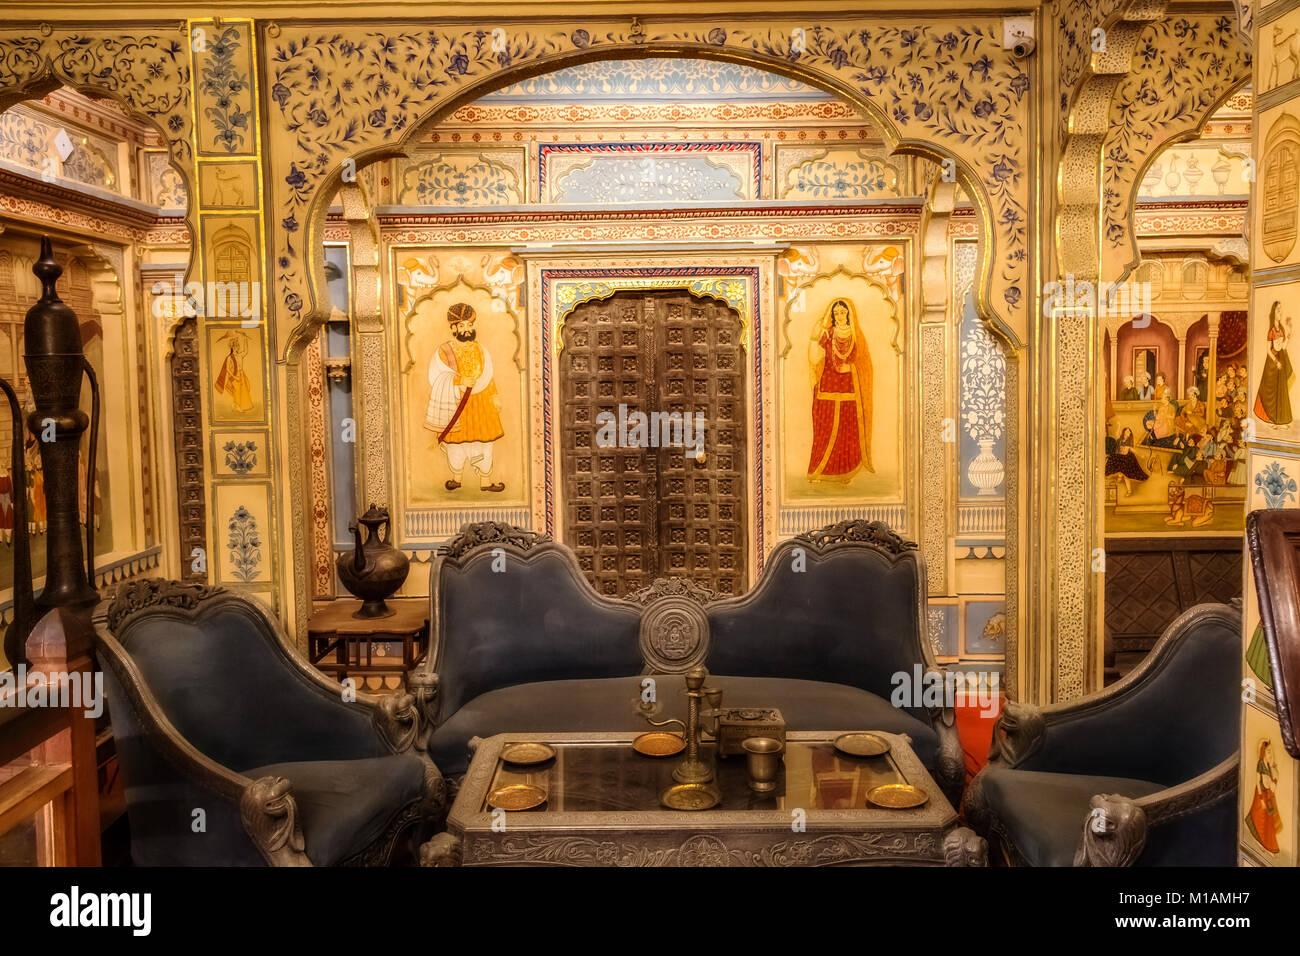 interior palaces stock photos interior palaces stock. Black Bedroom Furniture Sets. Home Design Ideas